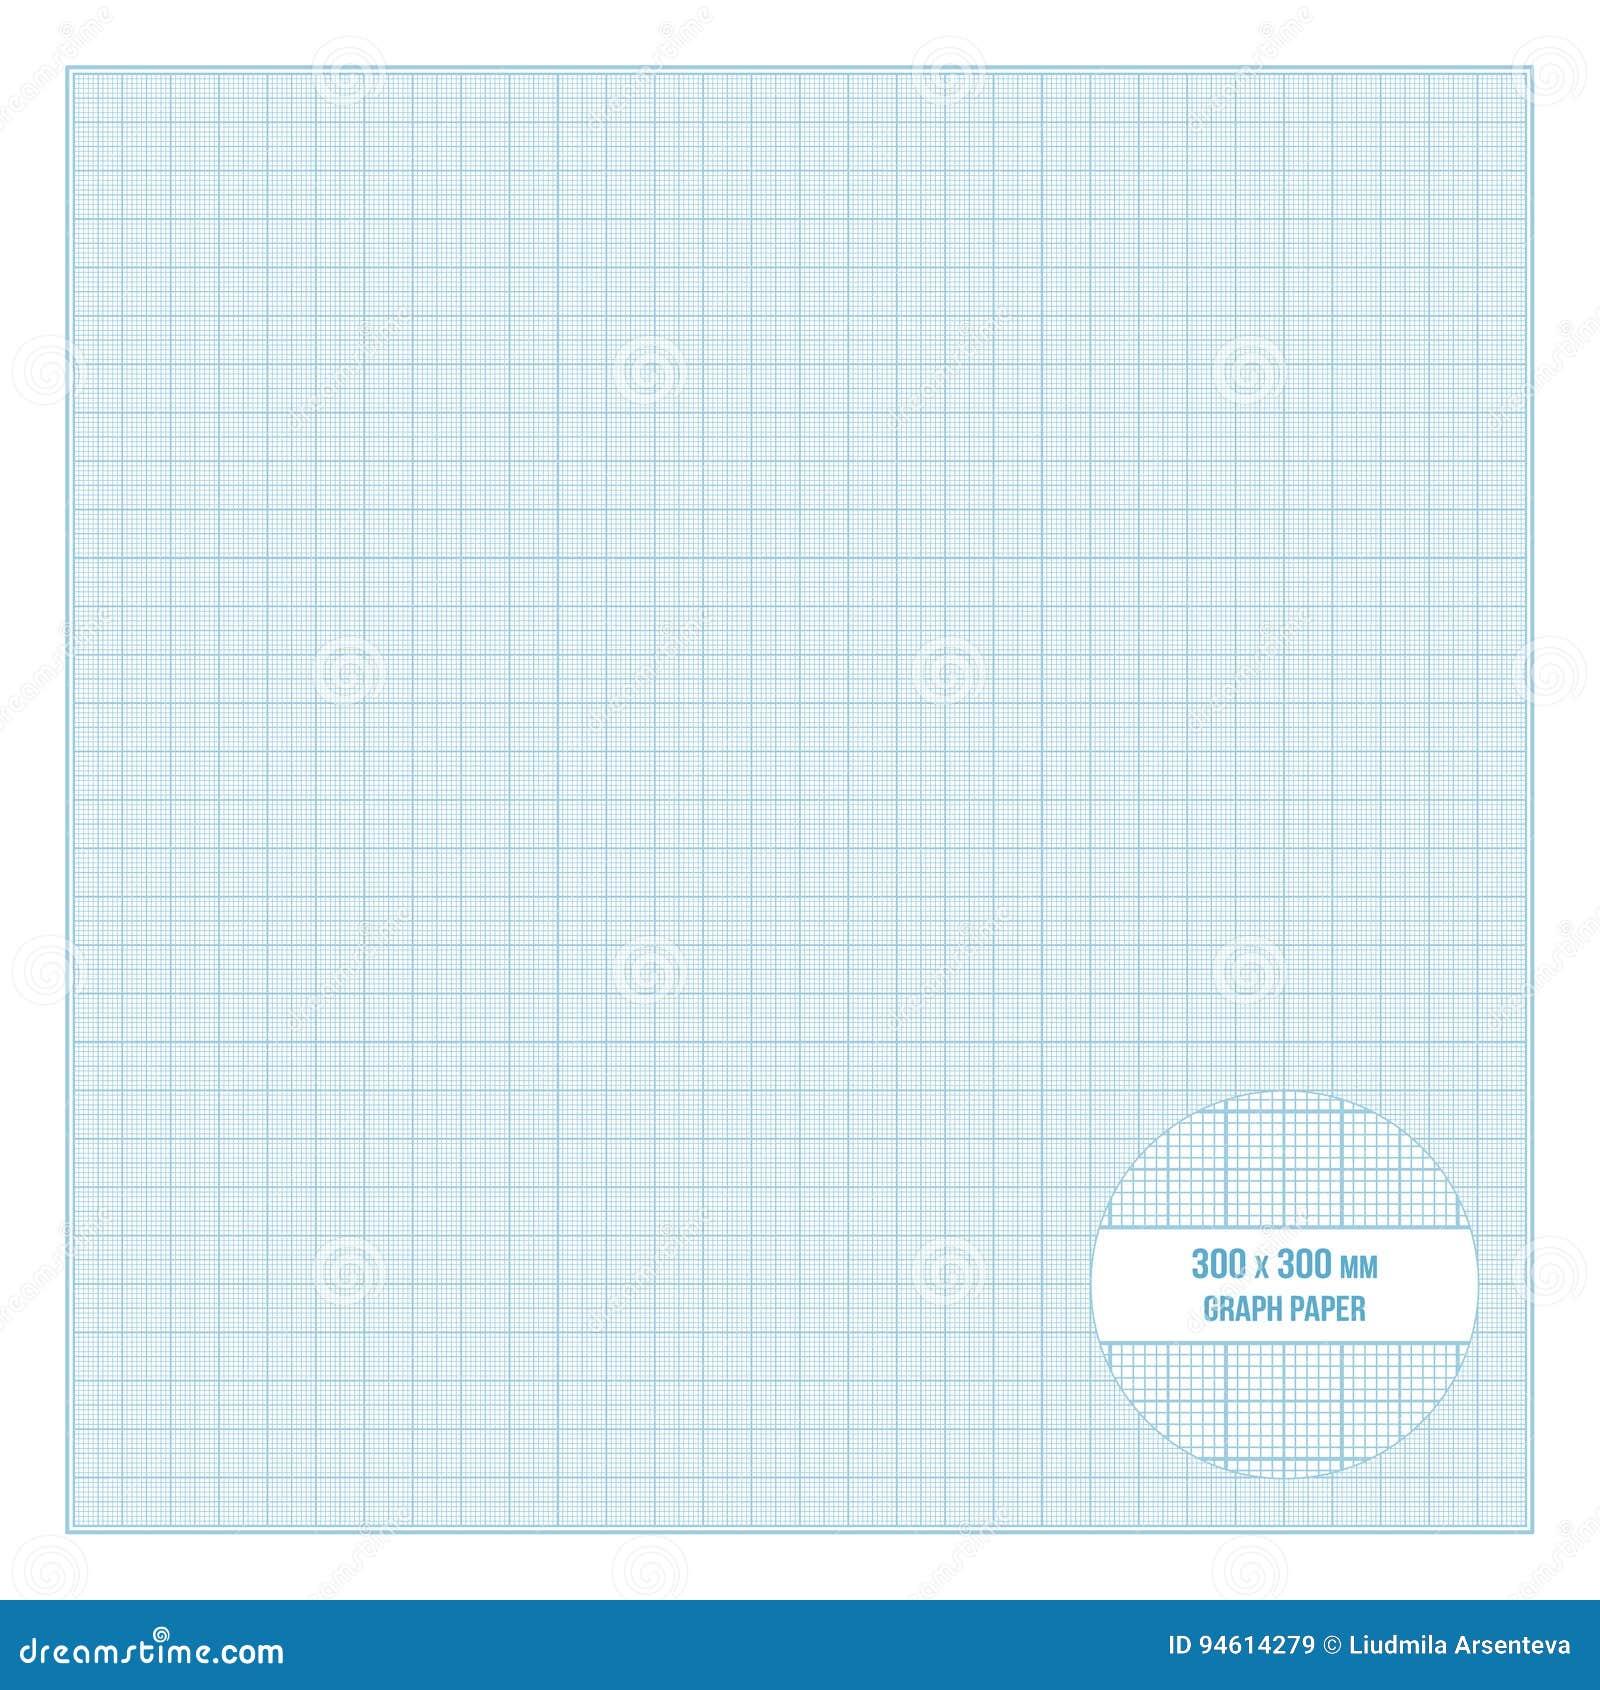 vector printable metric graph paper 30x30 cm size stock